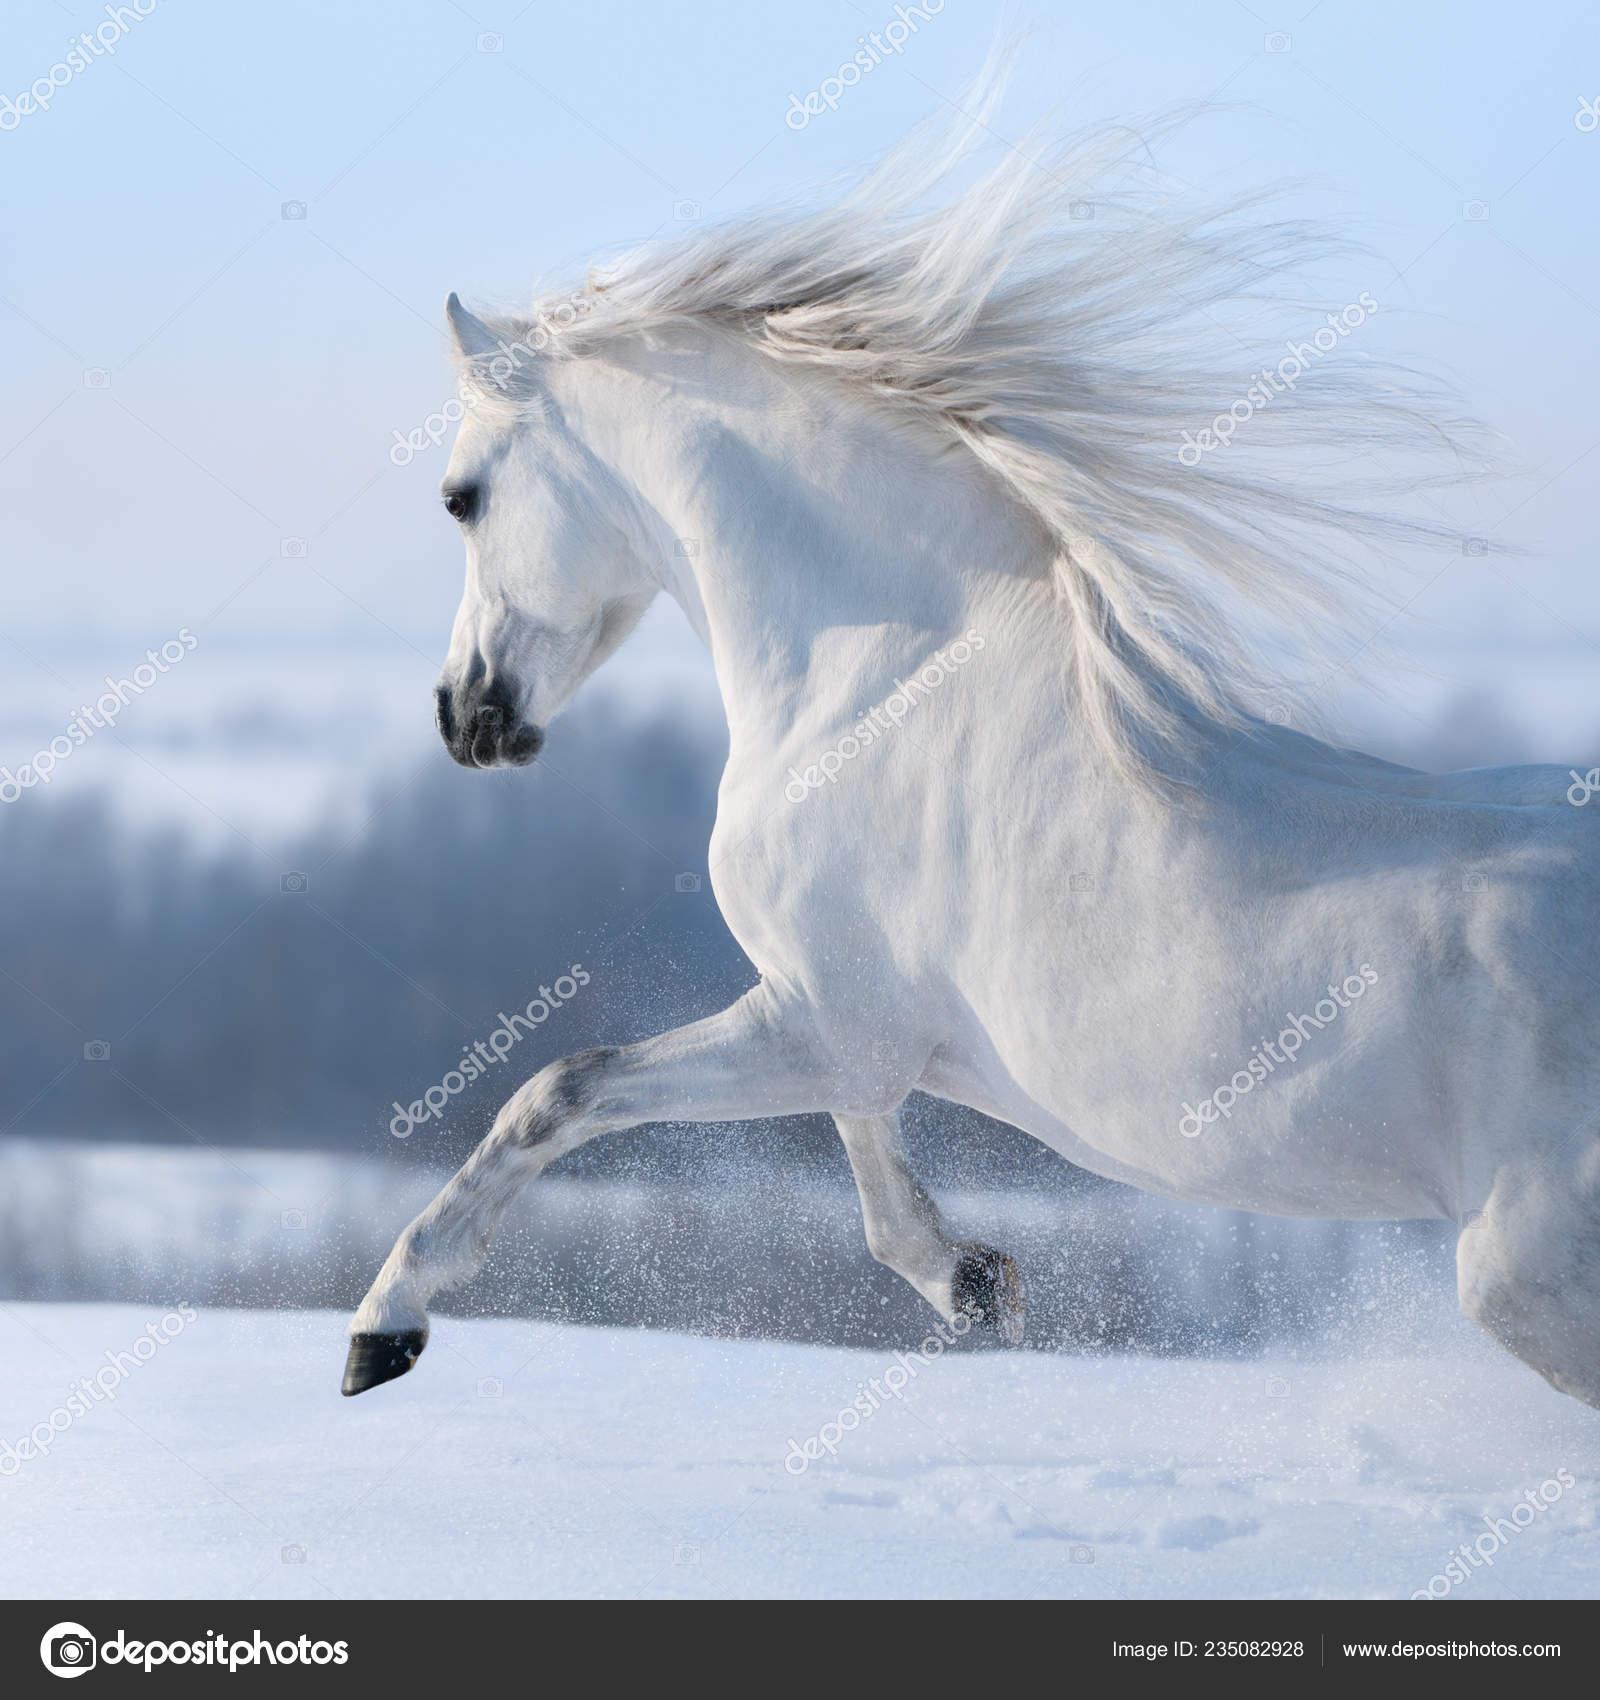 Beautiful White Horse Long Mane Galloping Winter Snowy Meadow Stock Photo C Tristana 235082928